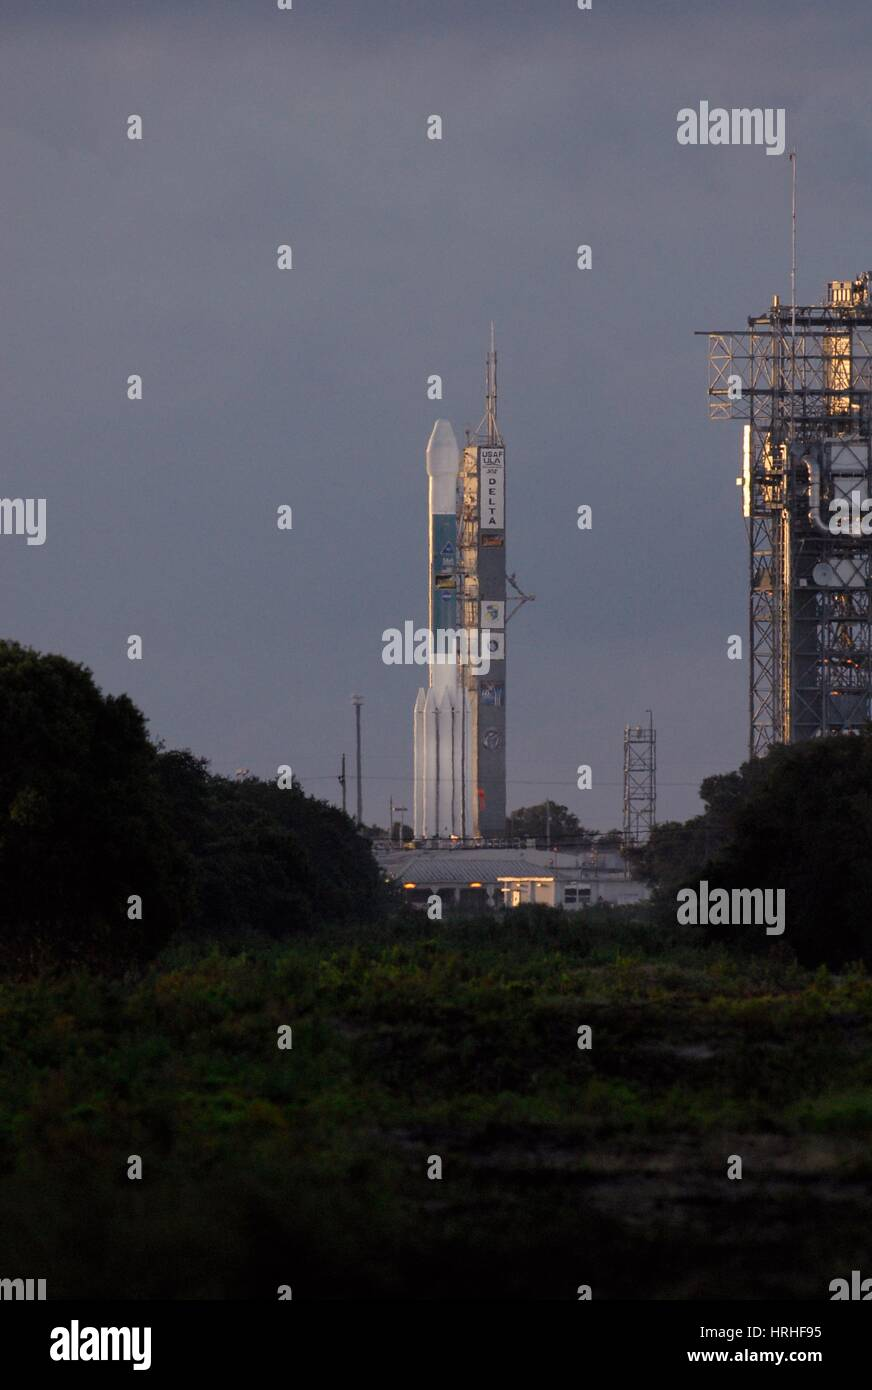 Dawn Spacecraft, 2007 - Stock Image